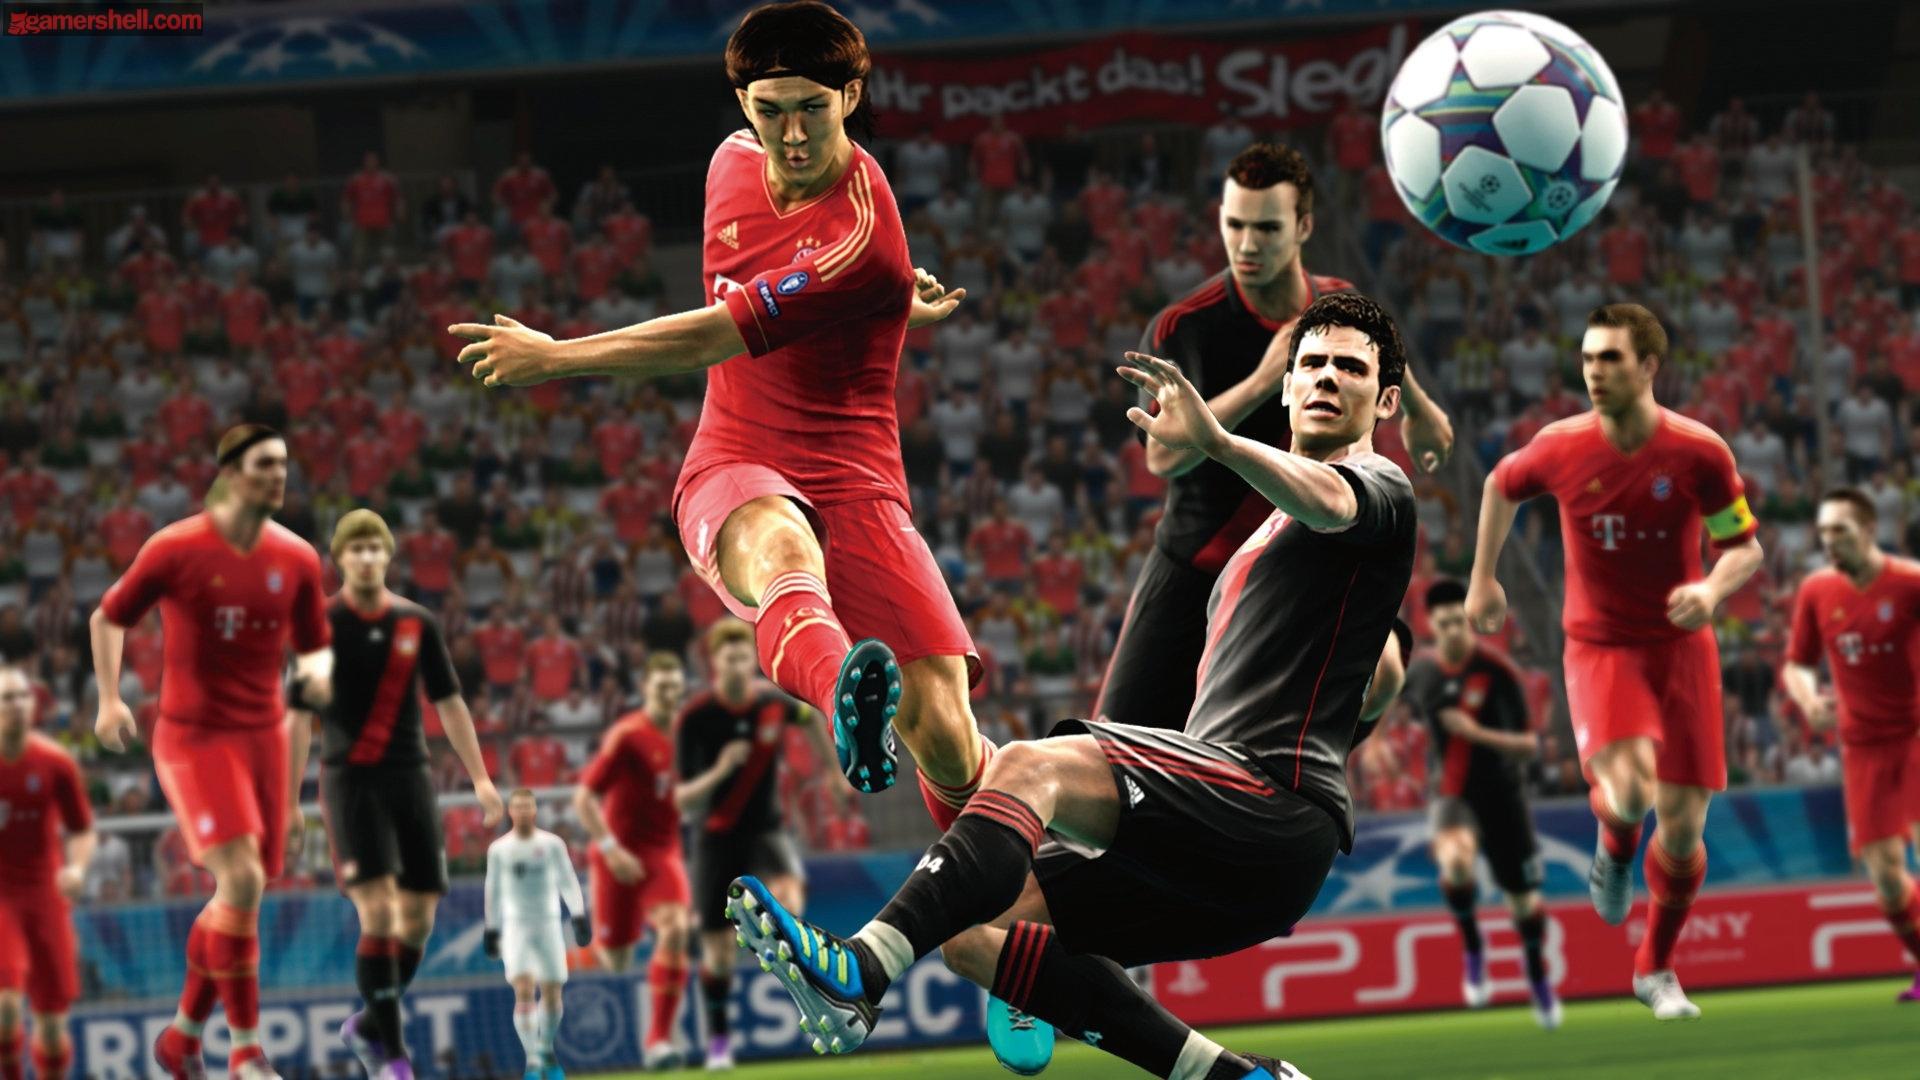 Pro Evolution Soccer 2012 Free Download Full PC Game